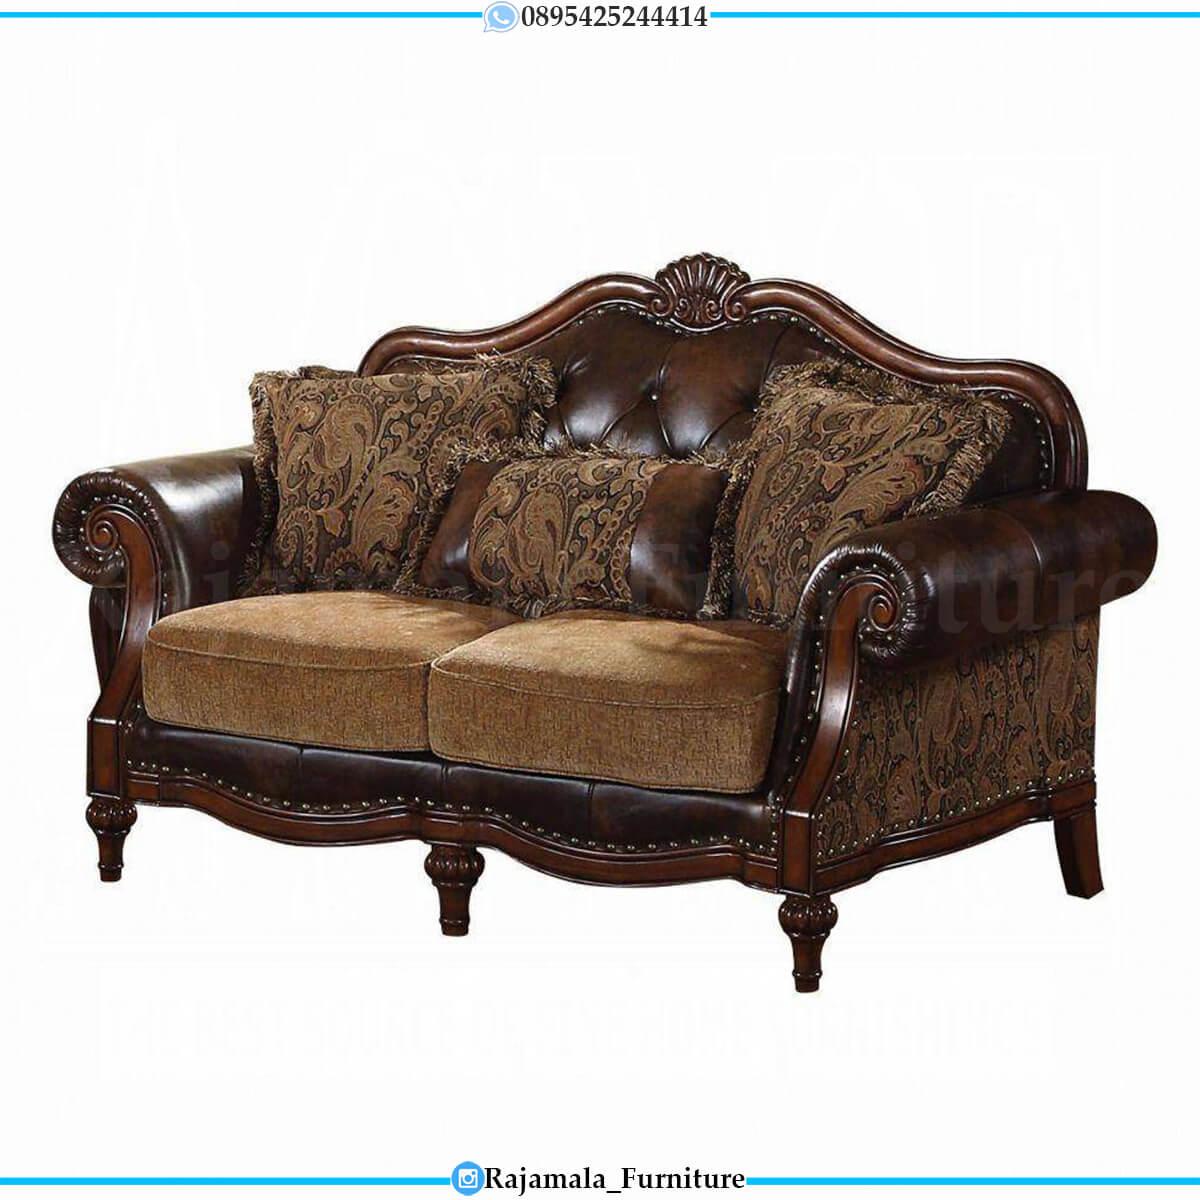 Sofa Tamu Mewah Jepara Luxury Carving Excellent Color RM-0733